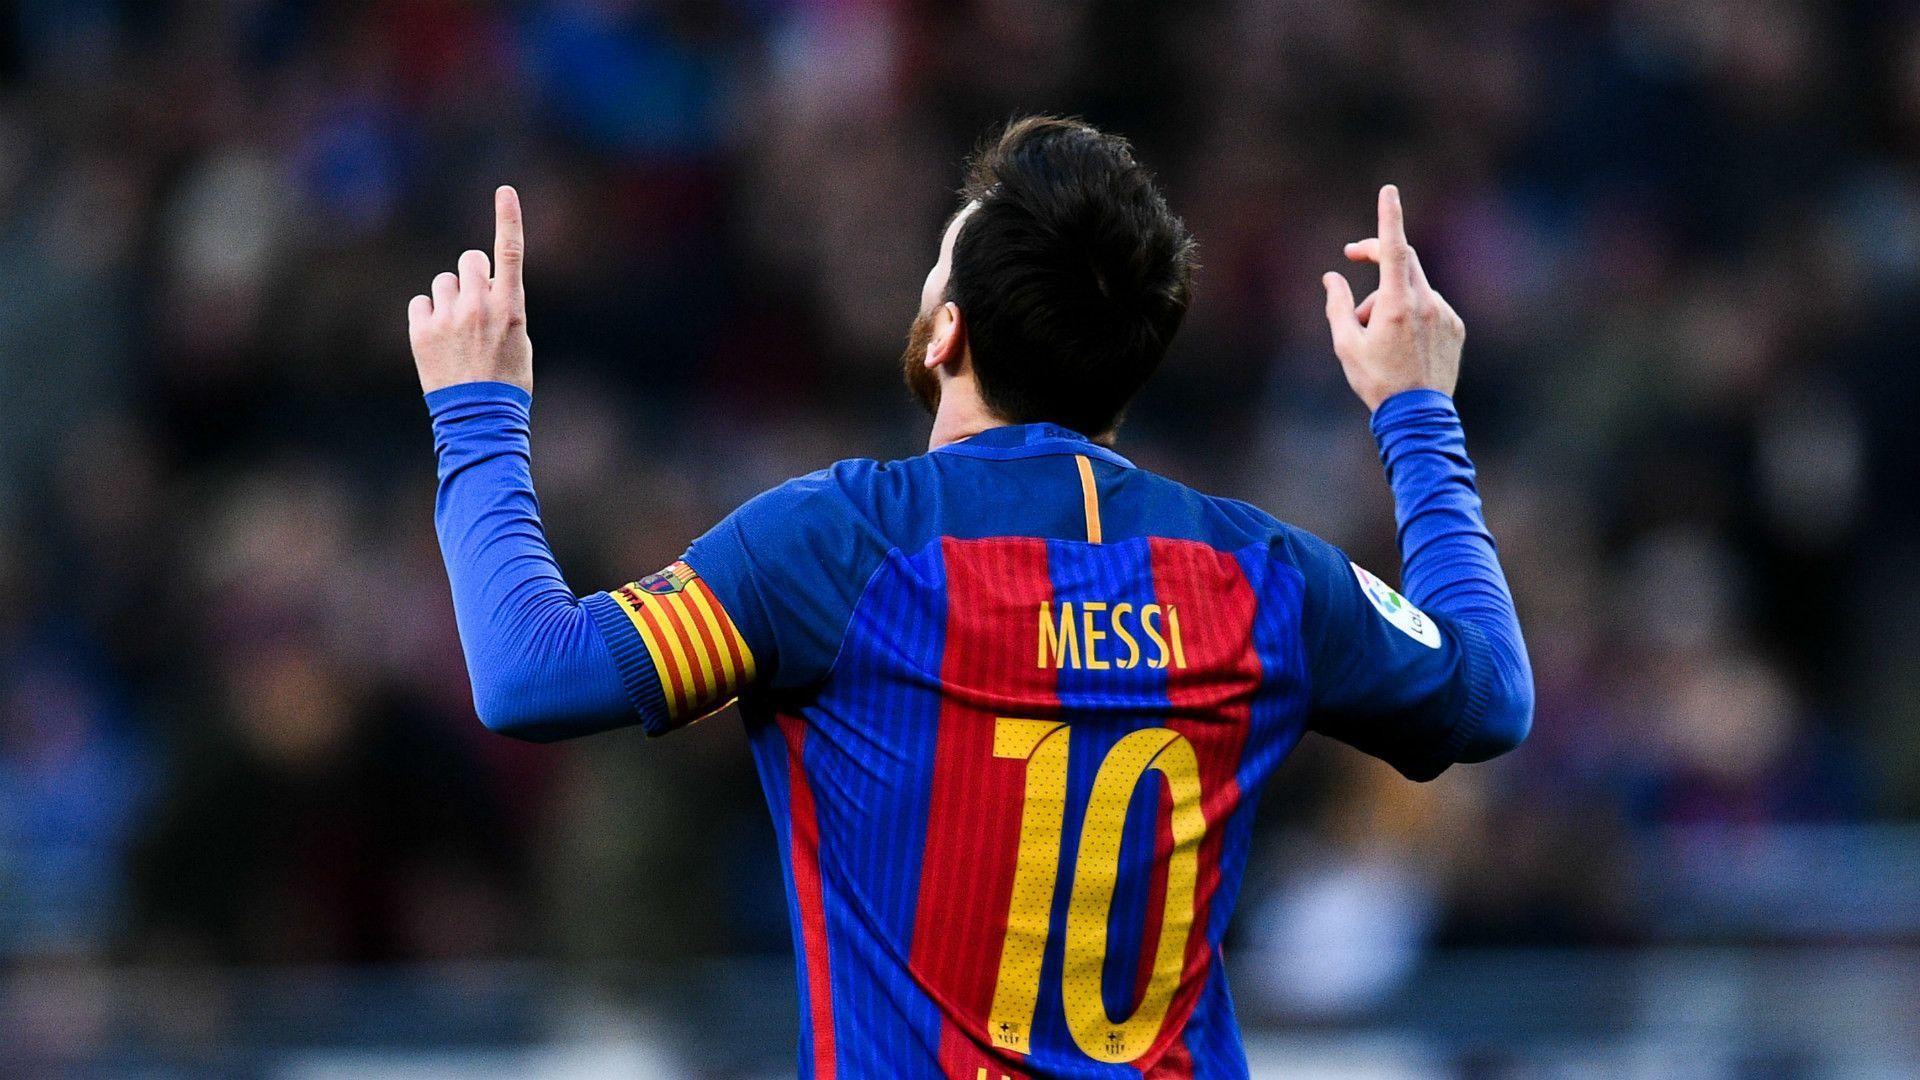 Messi 4K Wallpapers - Wallpaper Cave